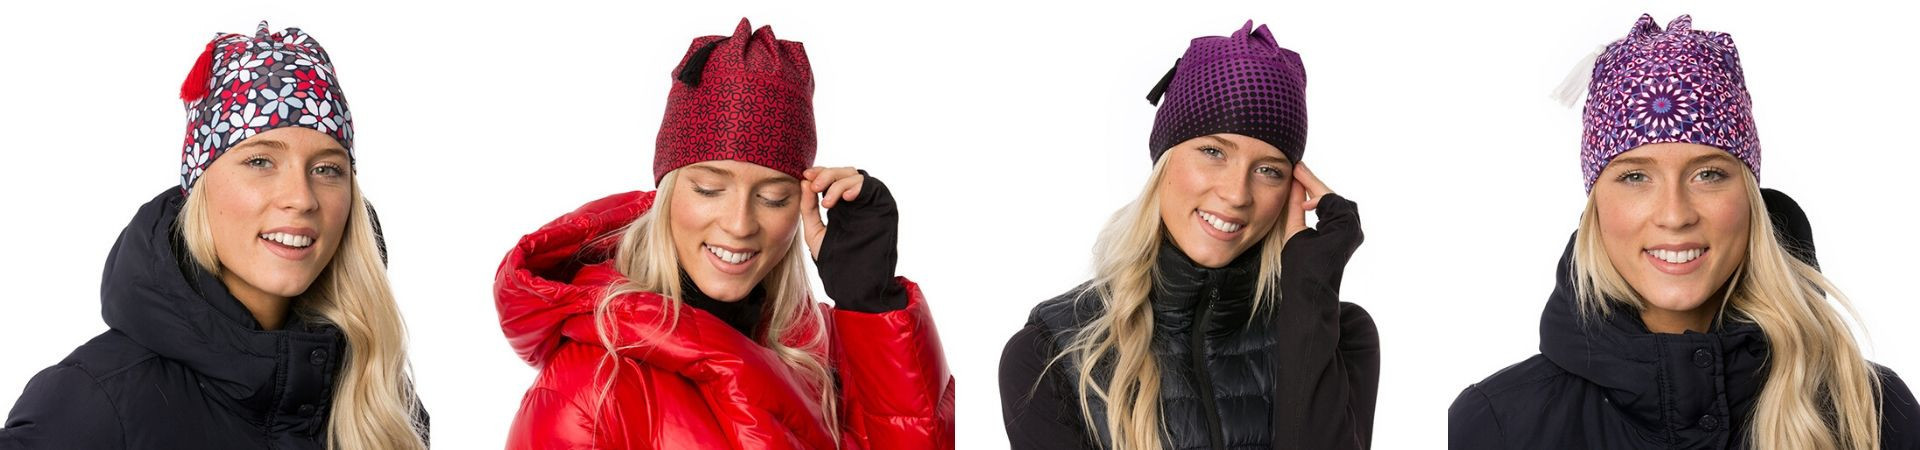 Discover our tassel toque with polar fleece headband.